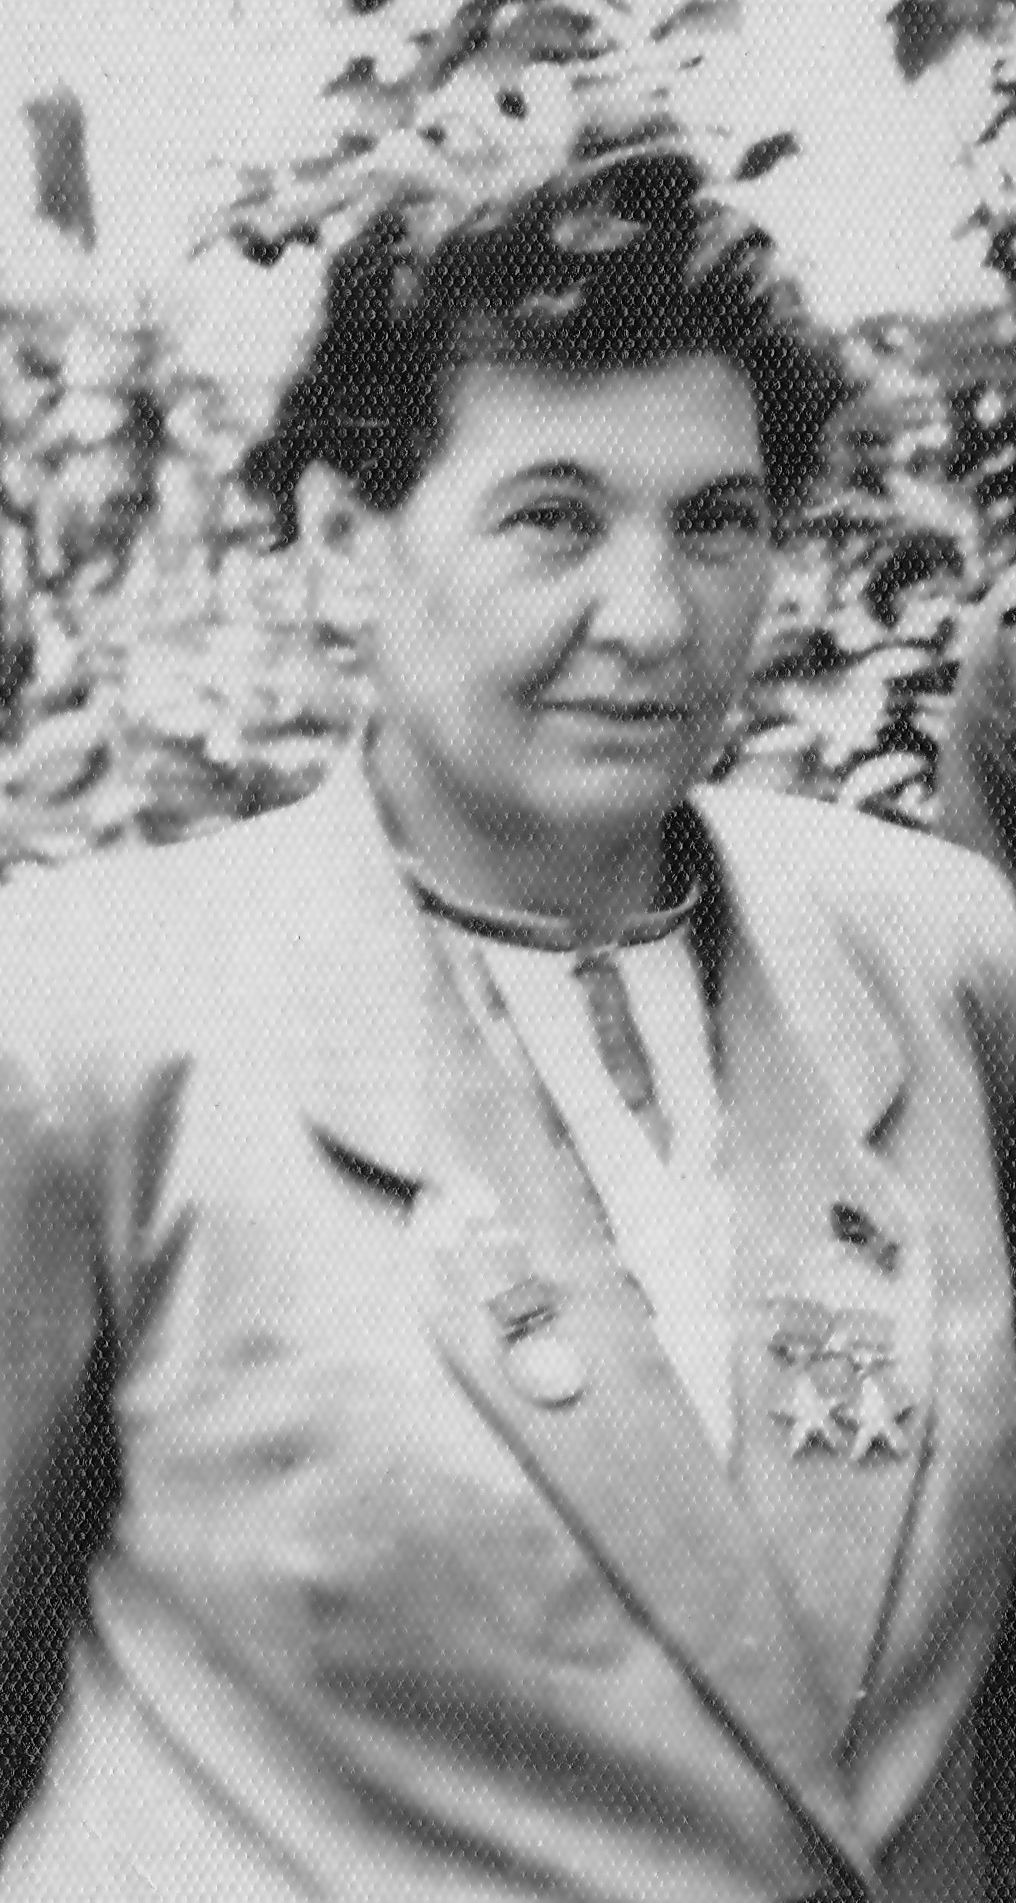 П.Н. Ангелина